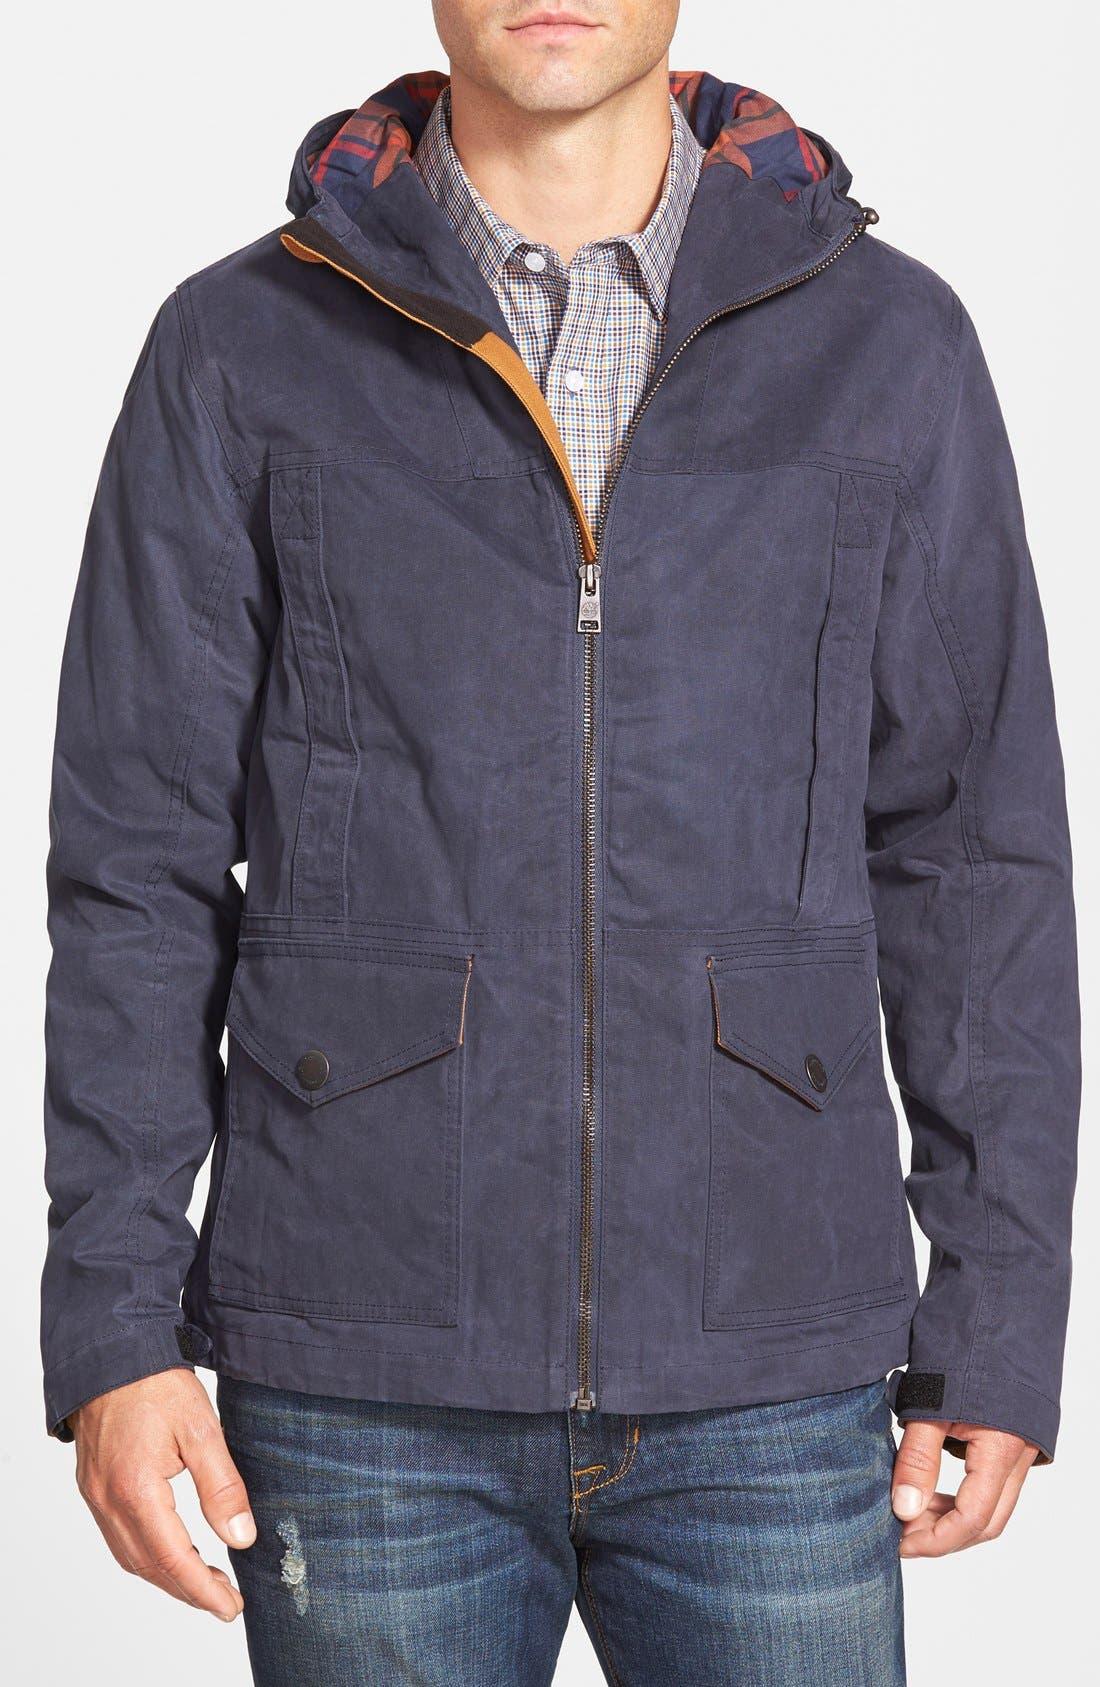 Alternate Image 1 Selected - Timberland 'Mount Davis' Waxed Cotton Hooded Jacket